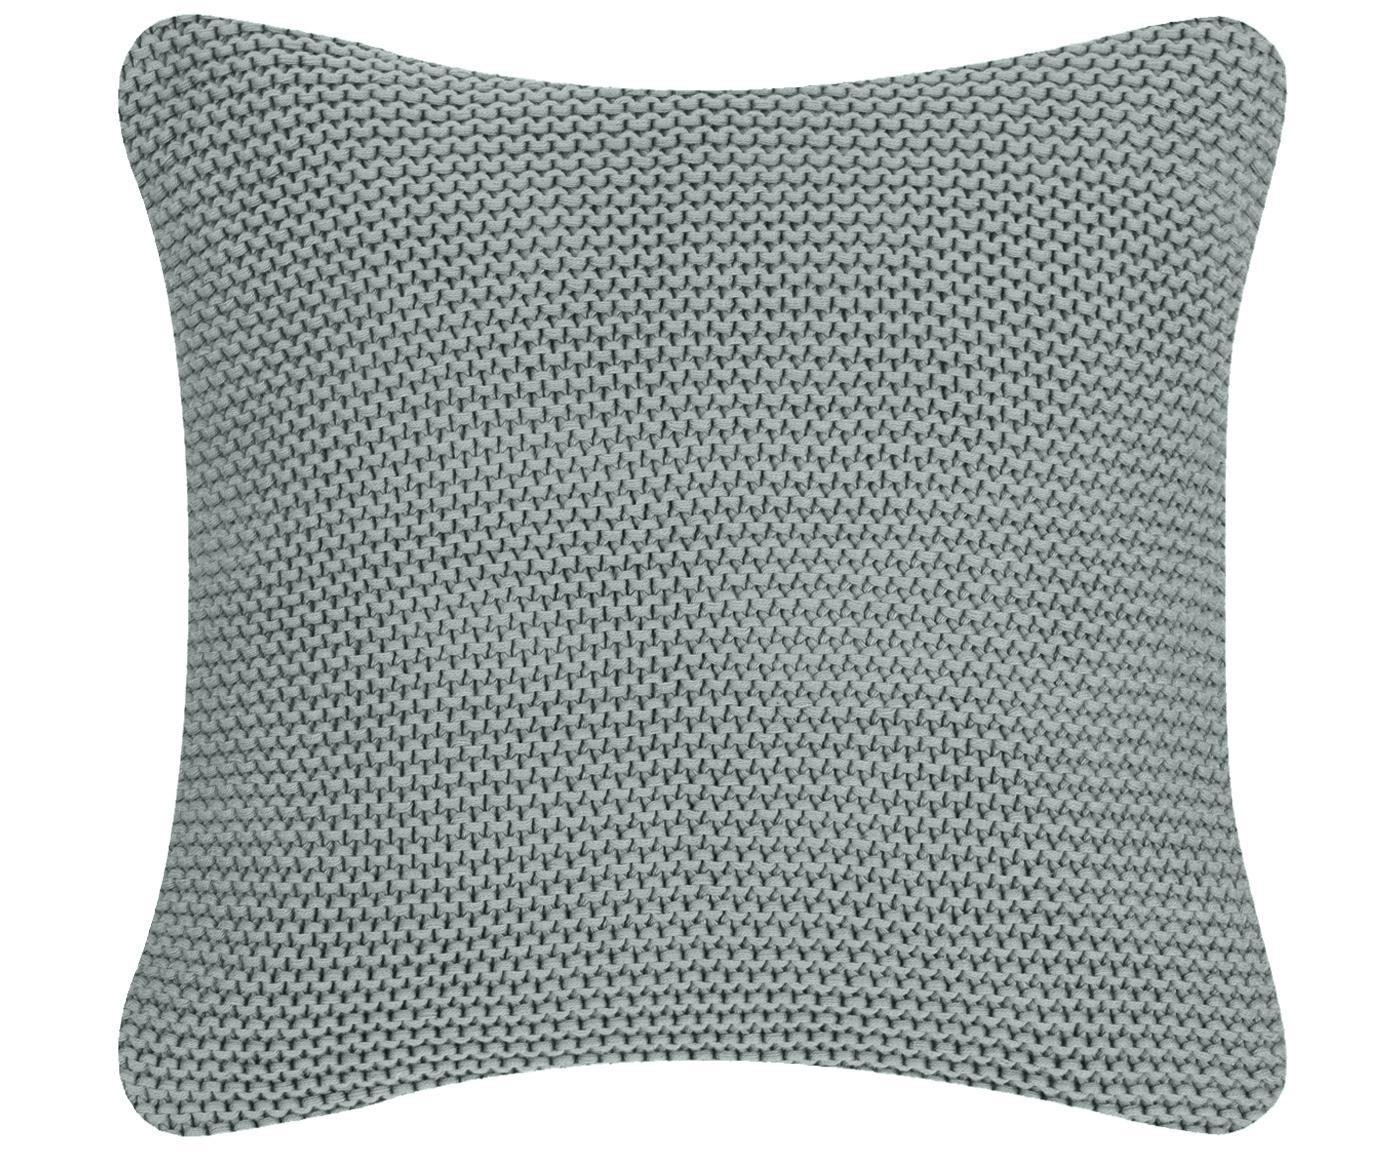 Federa arredo fatta a maglia Adalyn, 100% cotone, Verde salvia, Larg. 40 x Lung. 40 cm